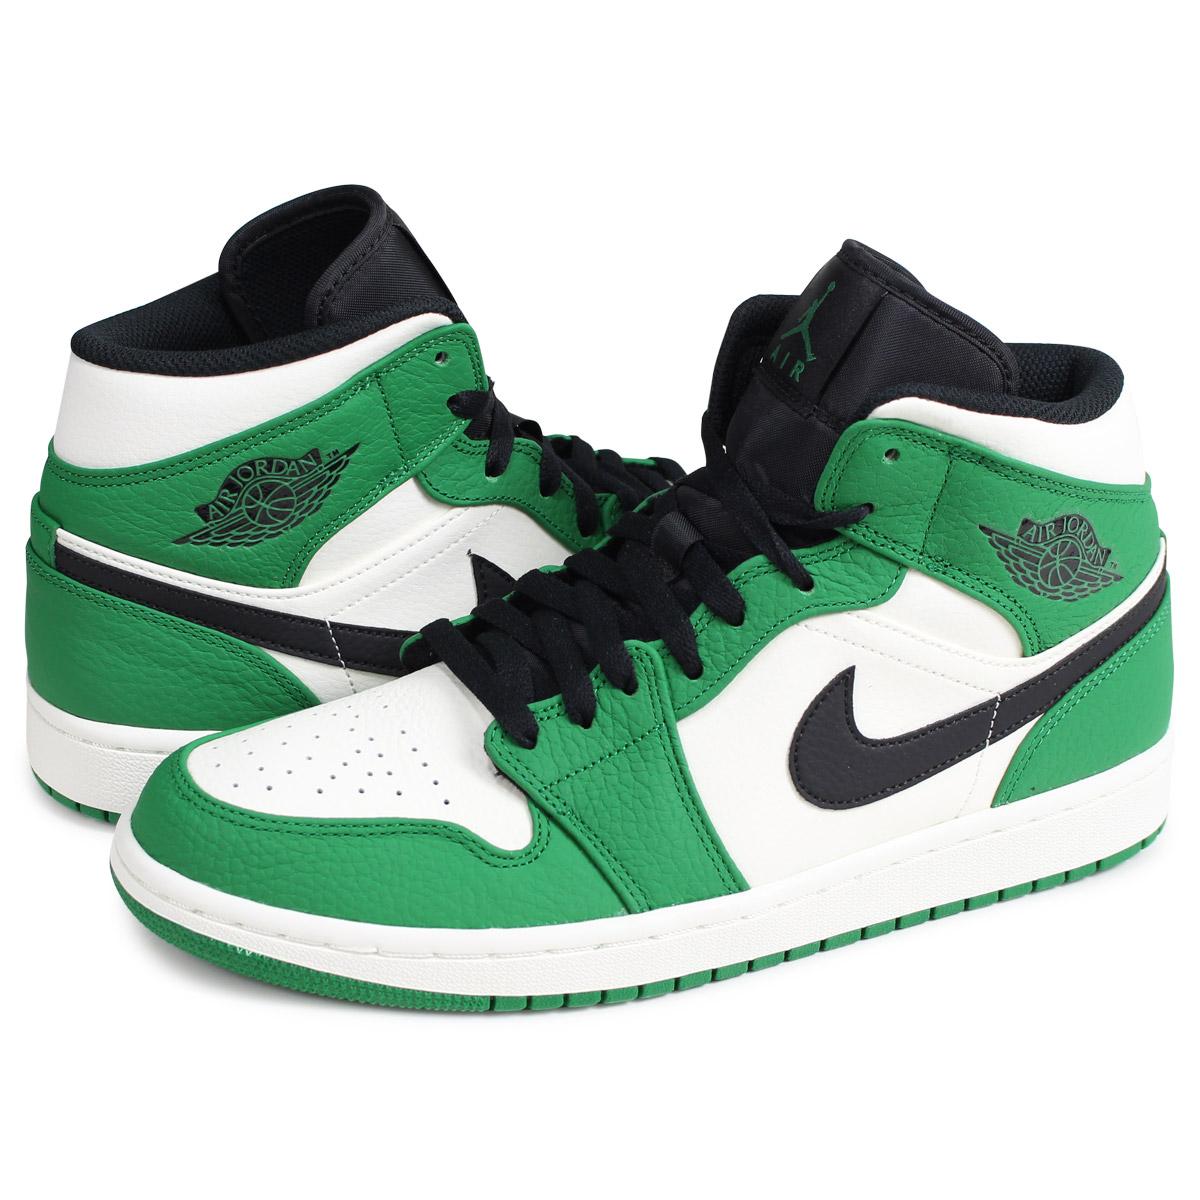 6e57ef683232 ALLSPORTS  Nike NIKE Air Jordan 1 sneakers men AIR JORDAN 1 MID SE ...